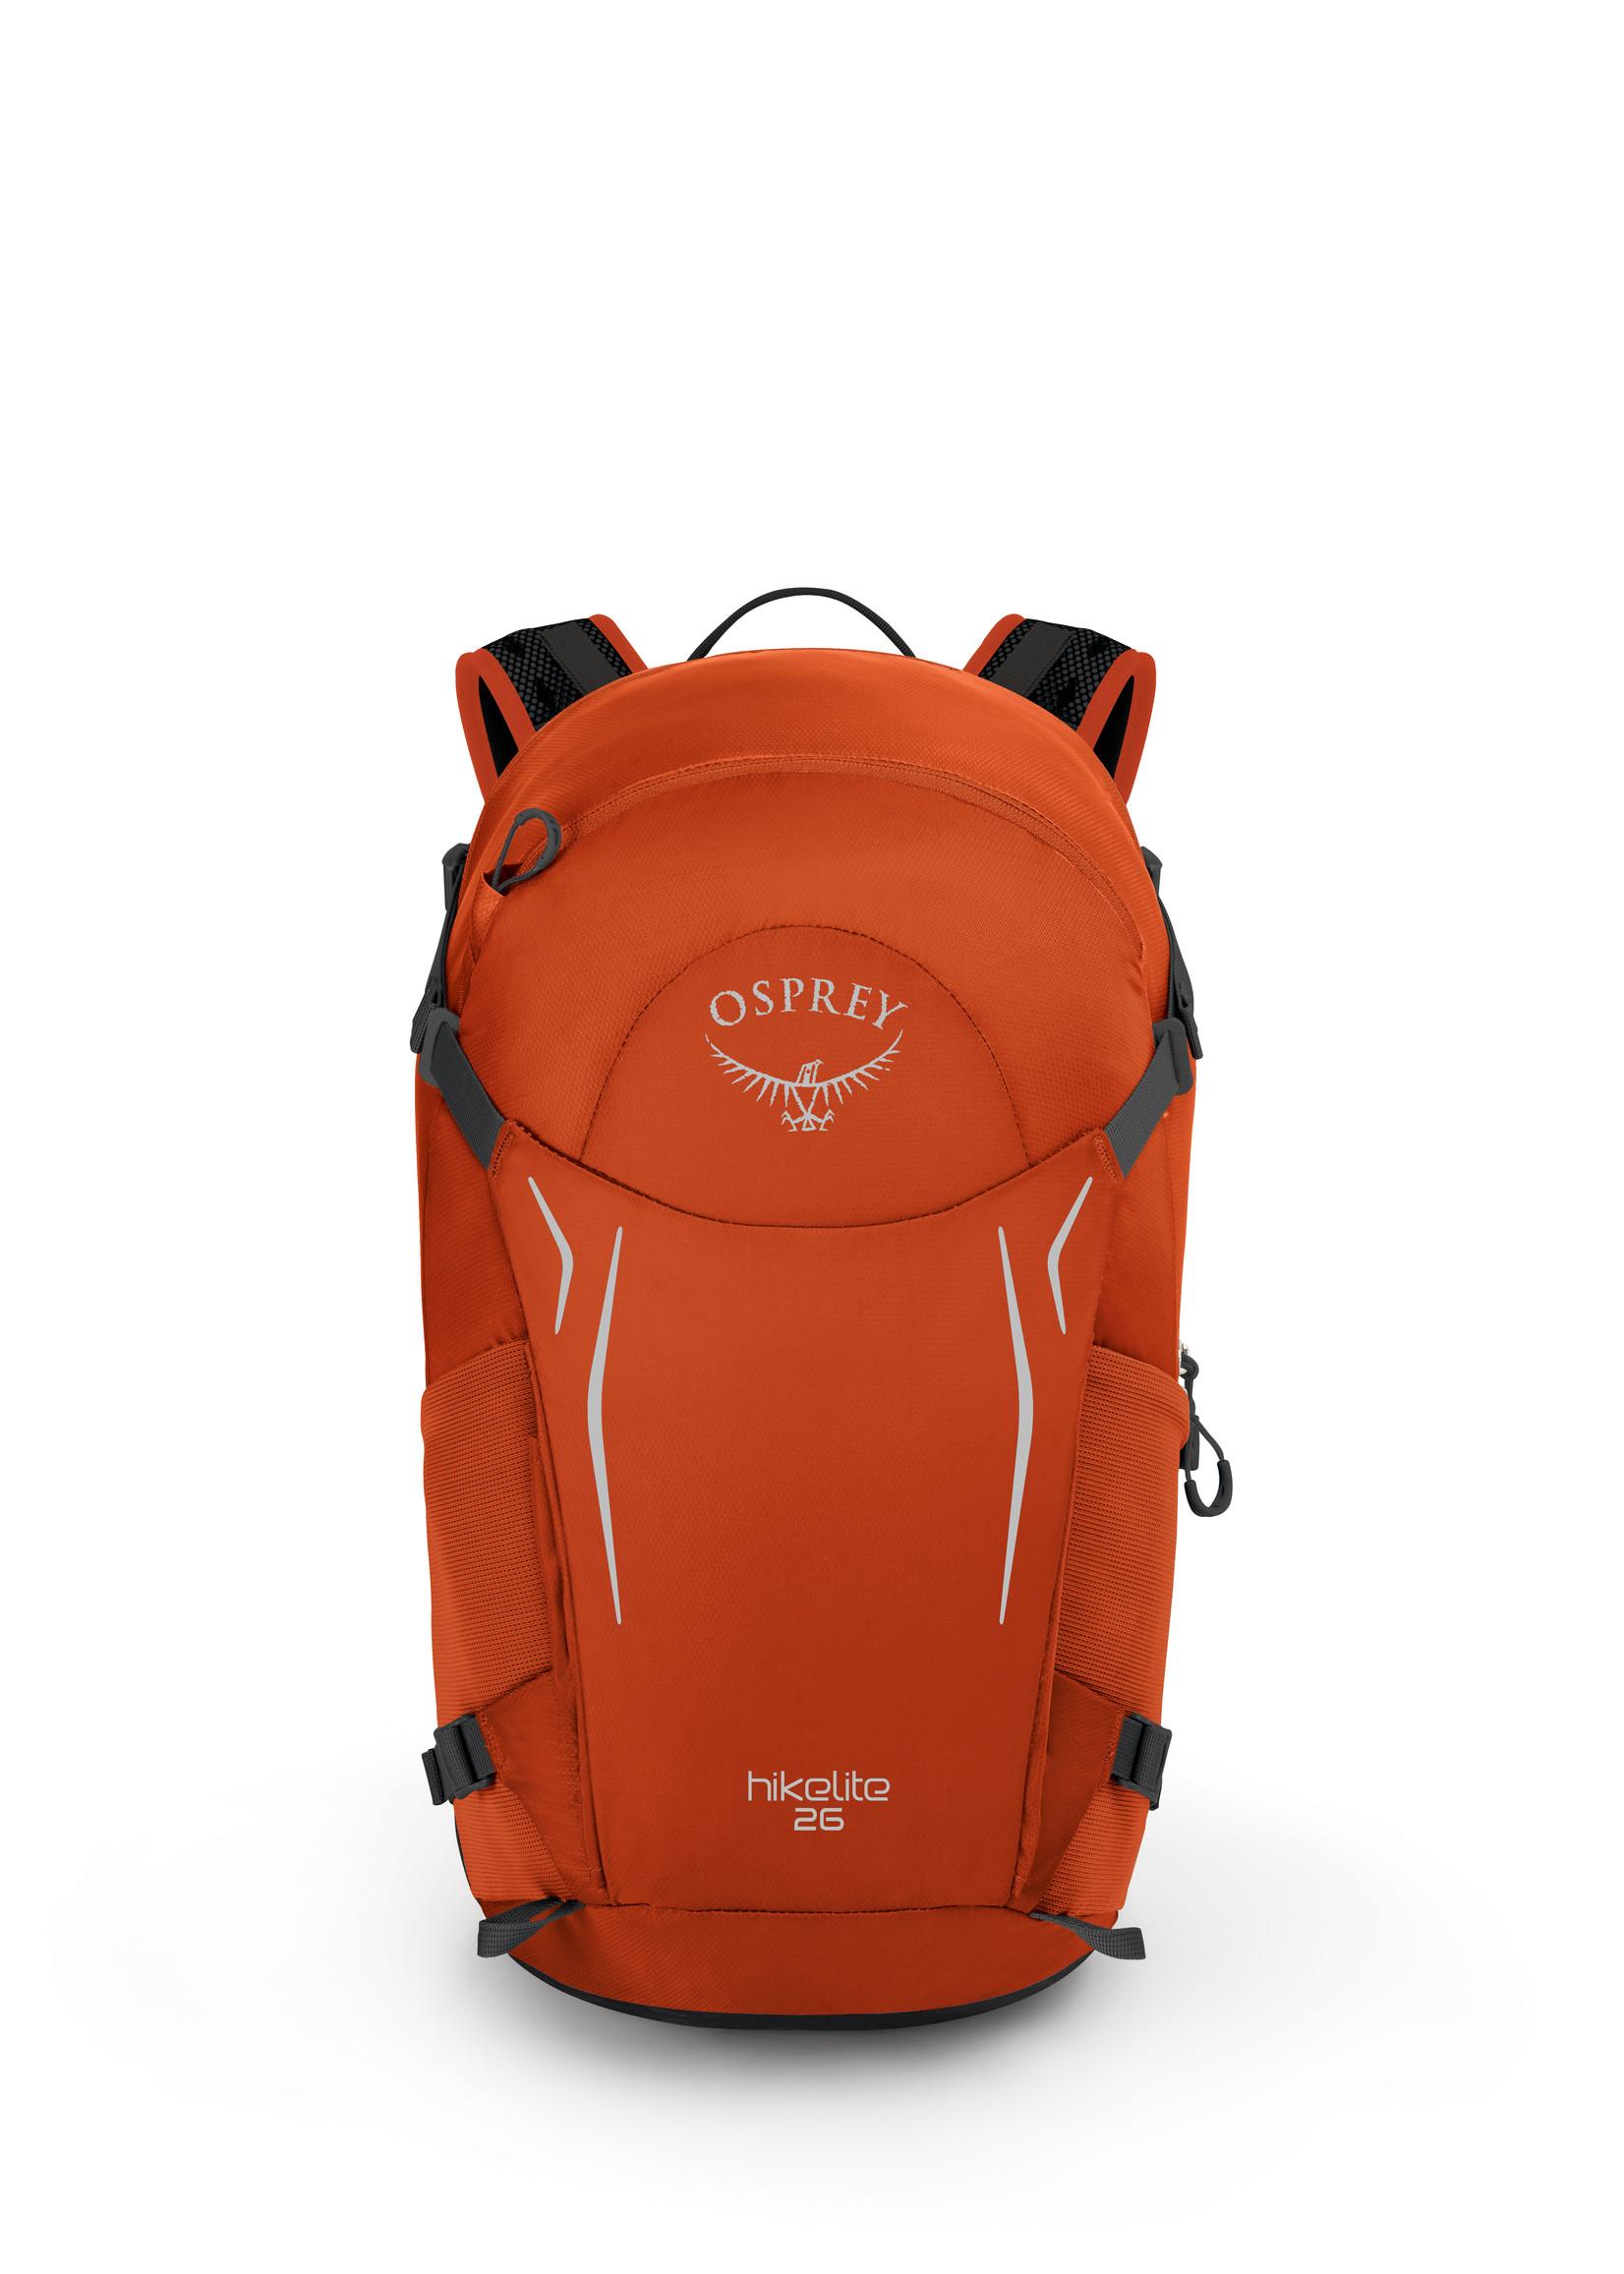 Osprey Hikelite 26